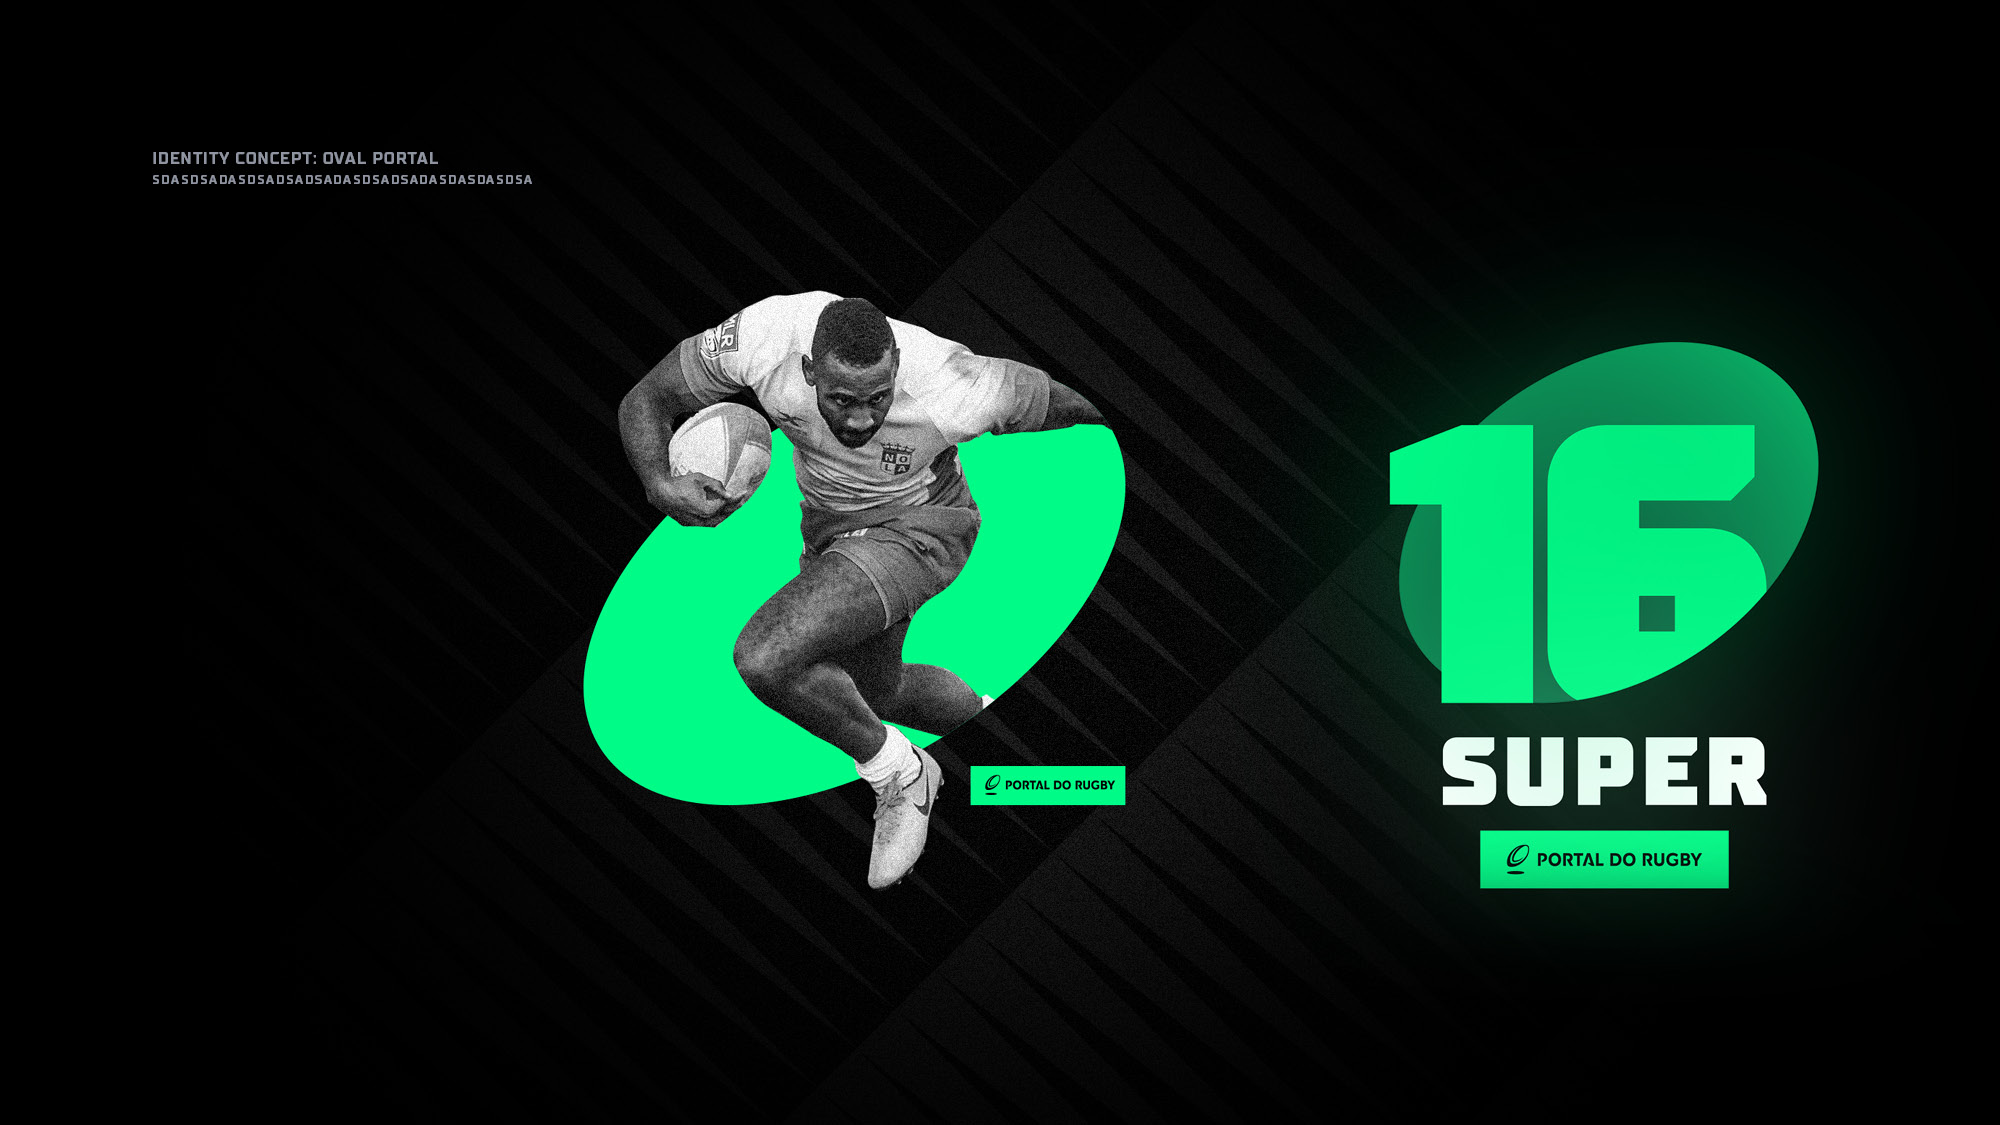 Nacione-Branding-Portal-do-Rugby14